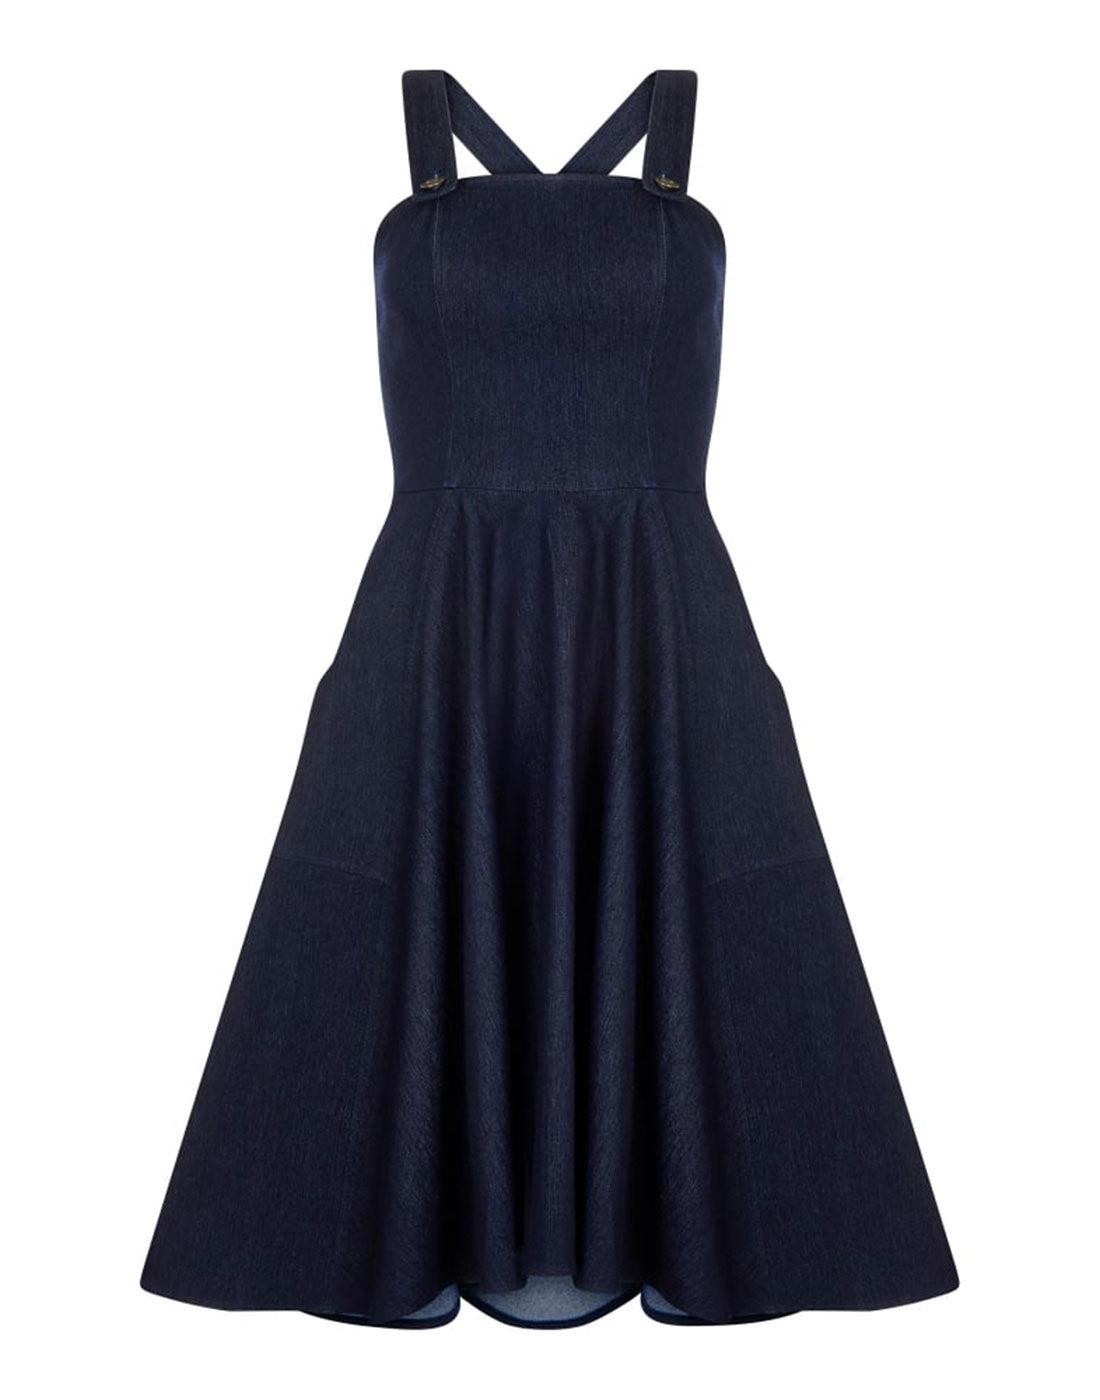 Odette BRIGHT & BEAUTIFUL Retro 70s Pinafore Dress